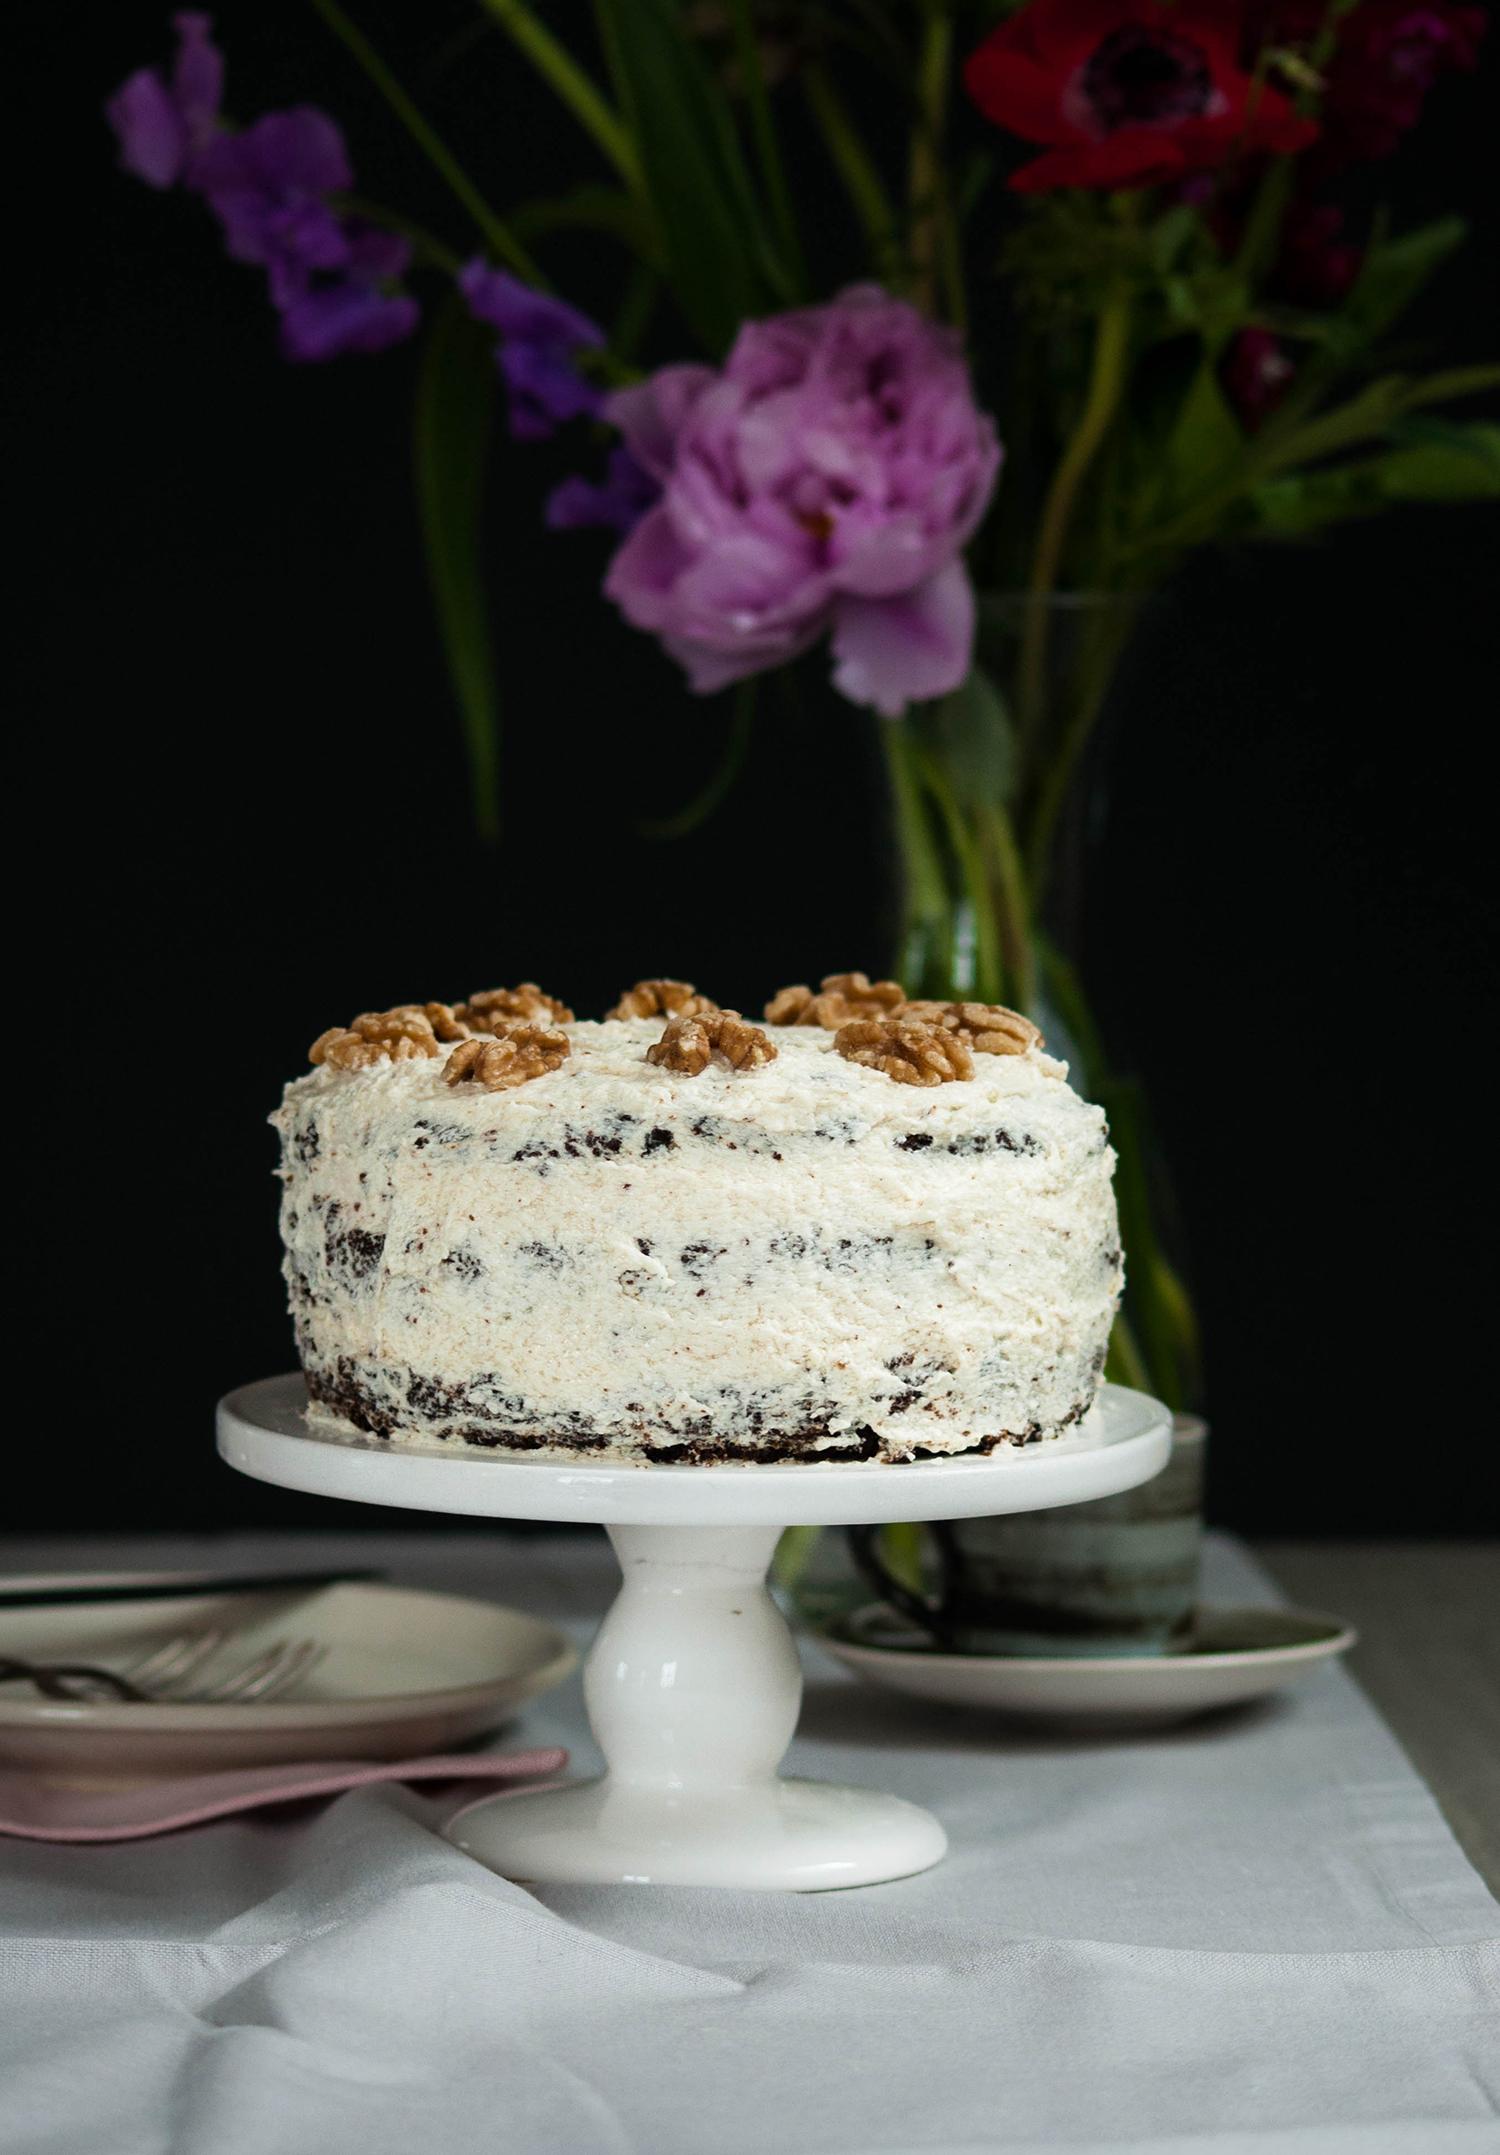 Vegan-carrot-cake-lea-lou-6